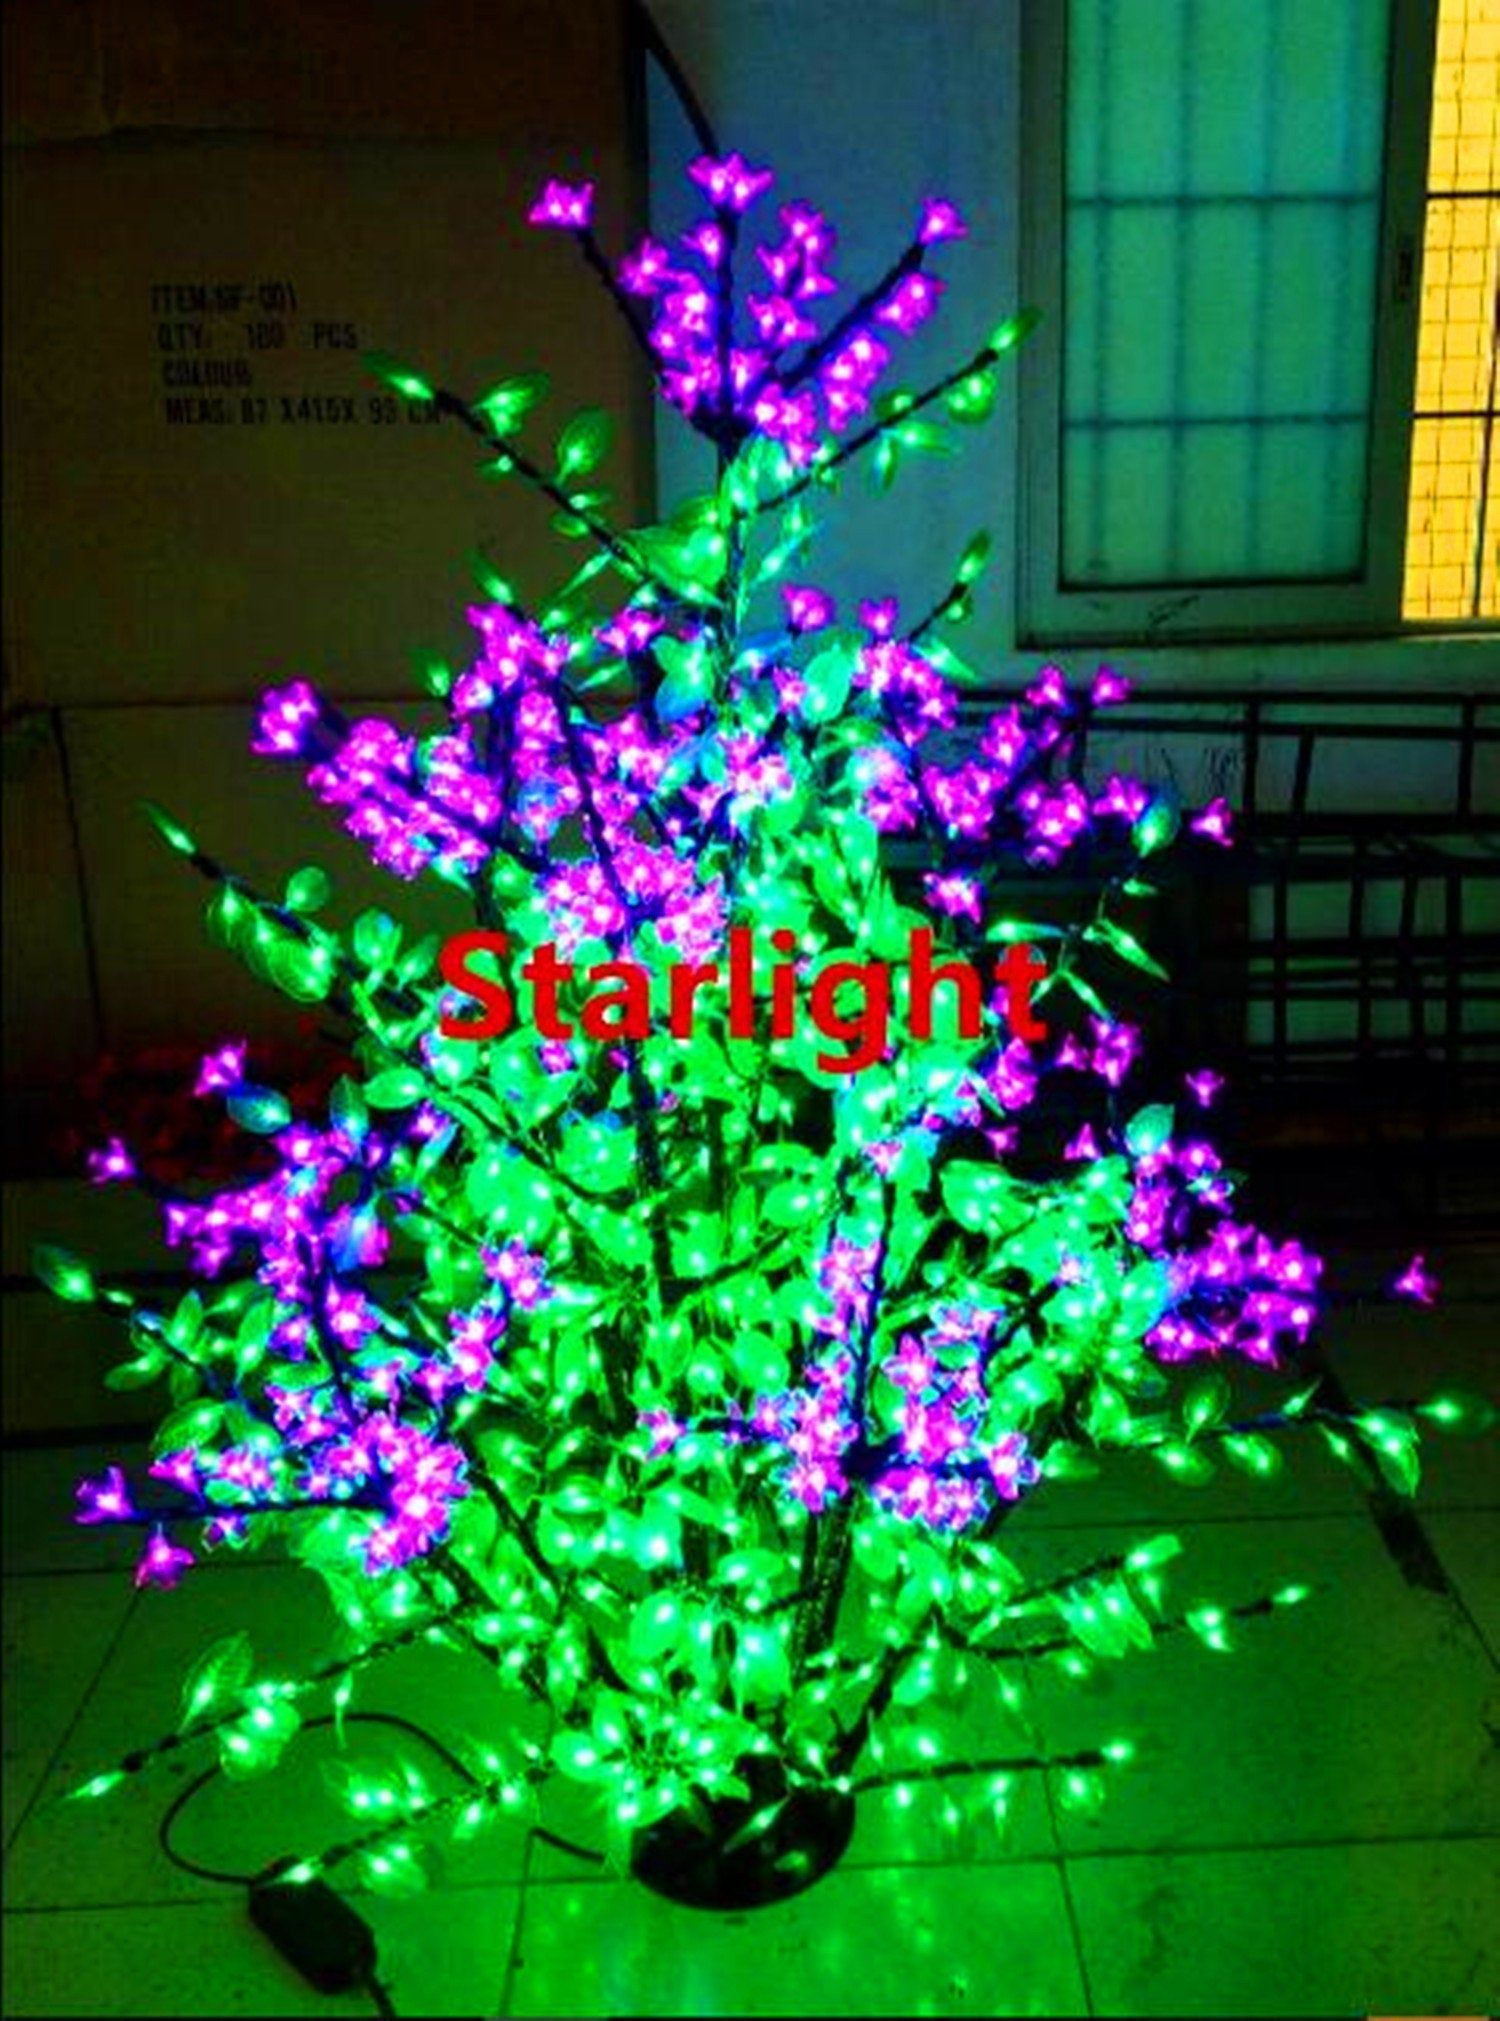 960pcs Leds 6ft 1 8m Led Cherry Blossom Tree Light Christmas Etsy In 2021 Artificial Cherry Blossom Tree Pink Flowering Trees Cherry Blossom Flowers